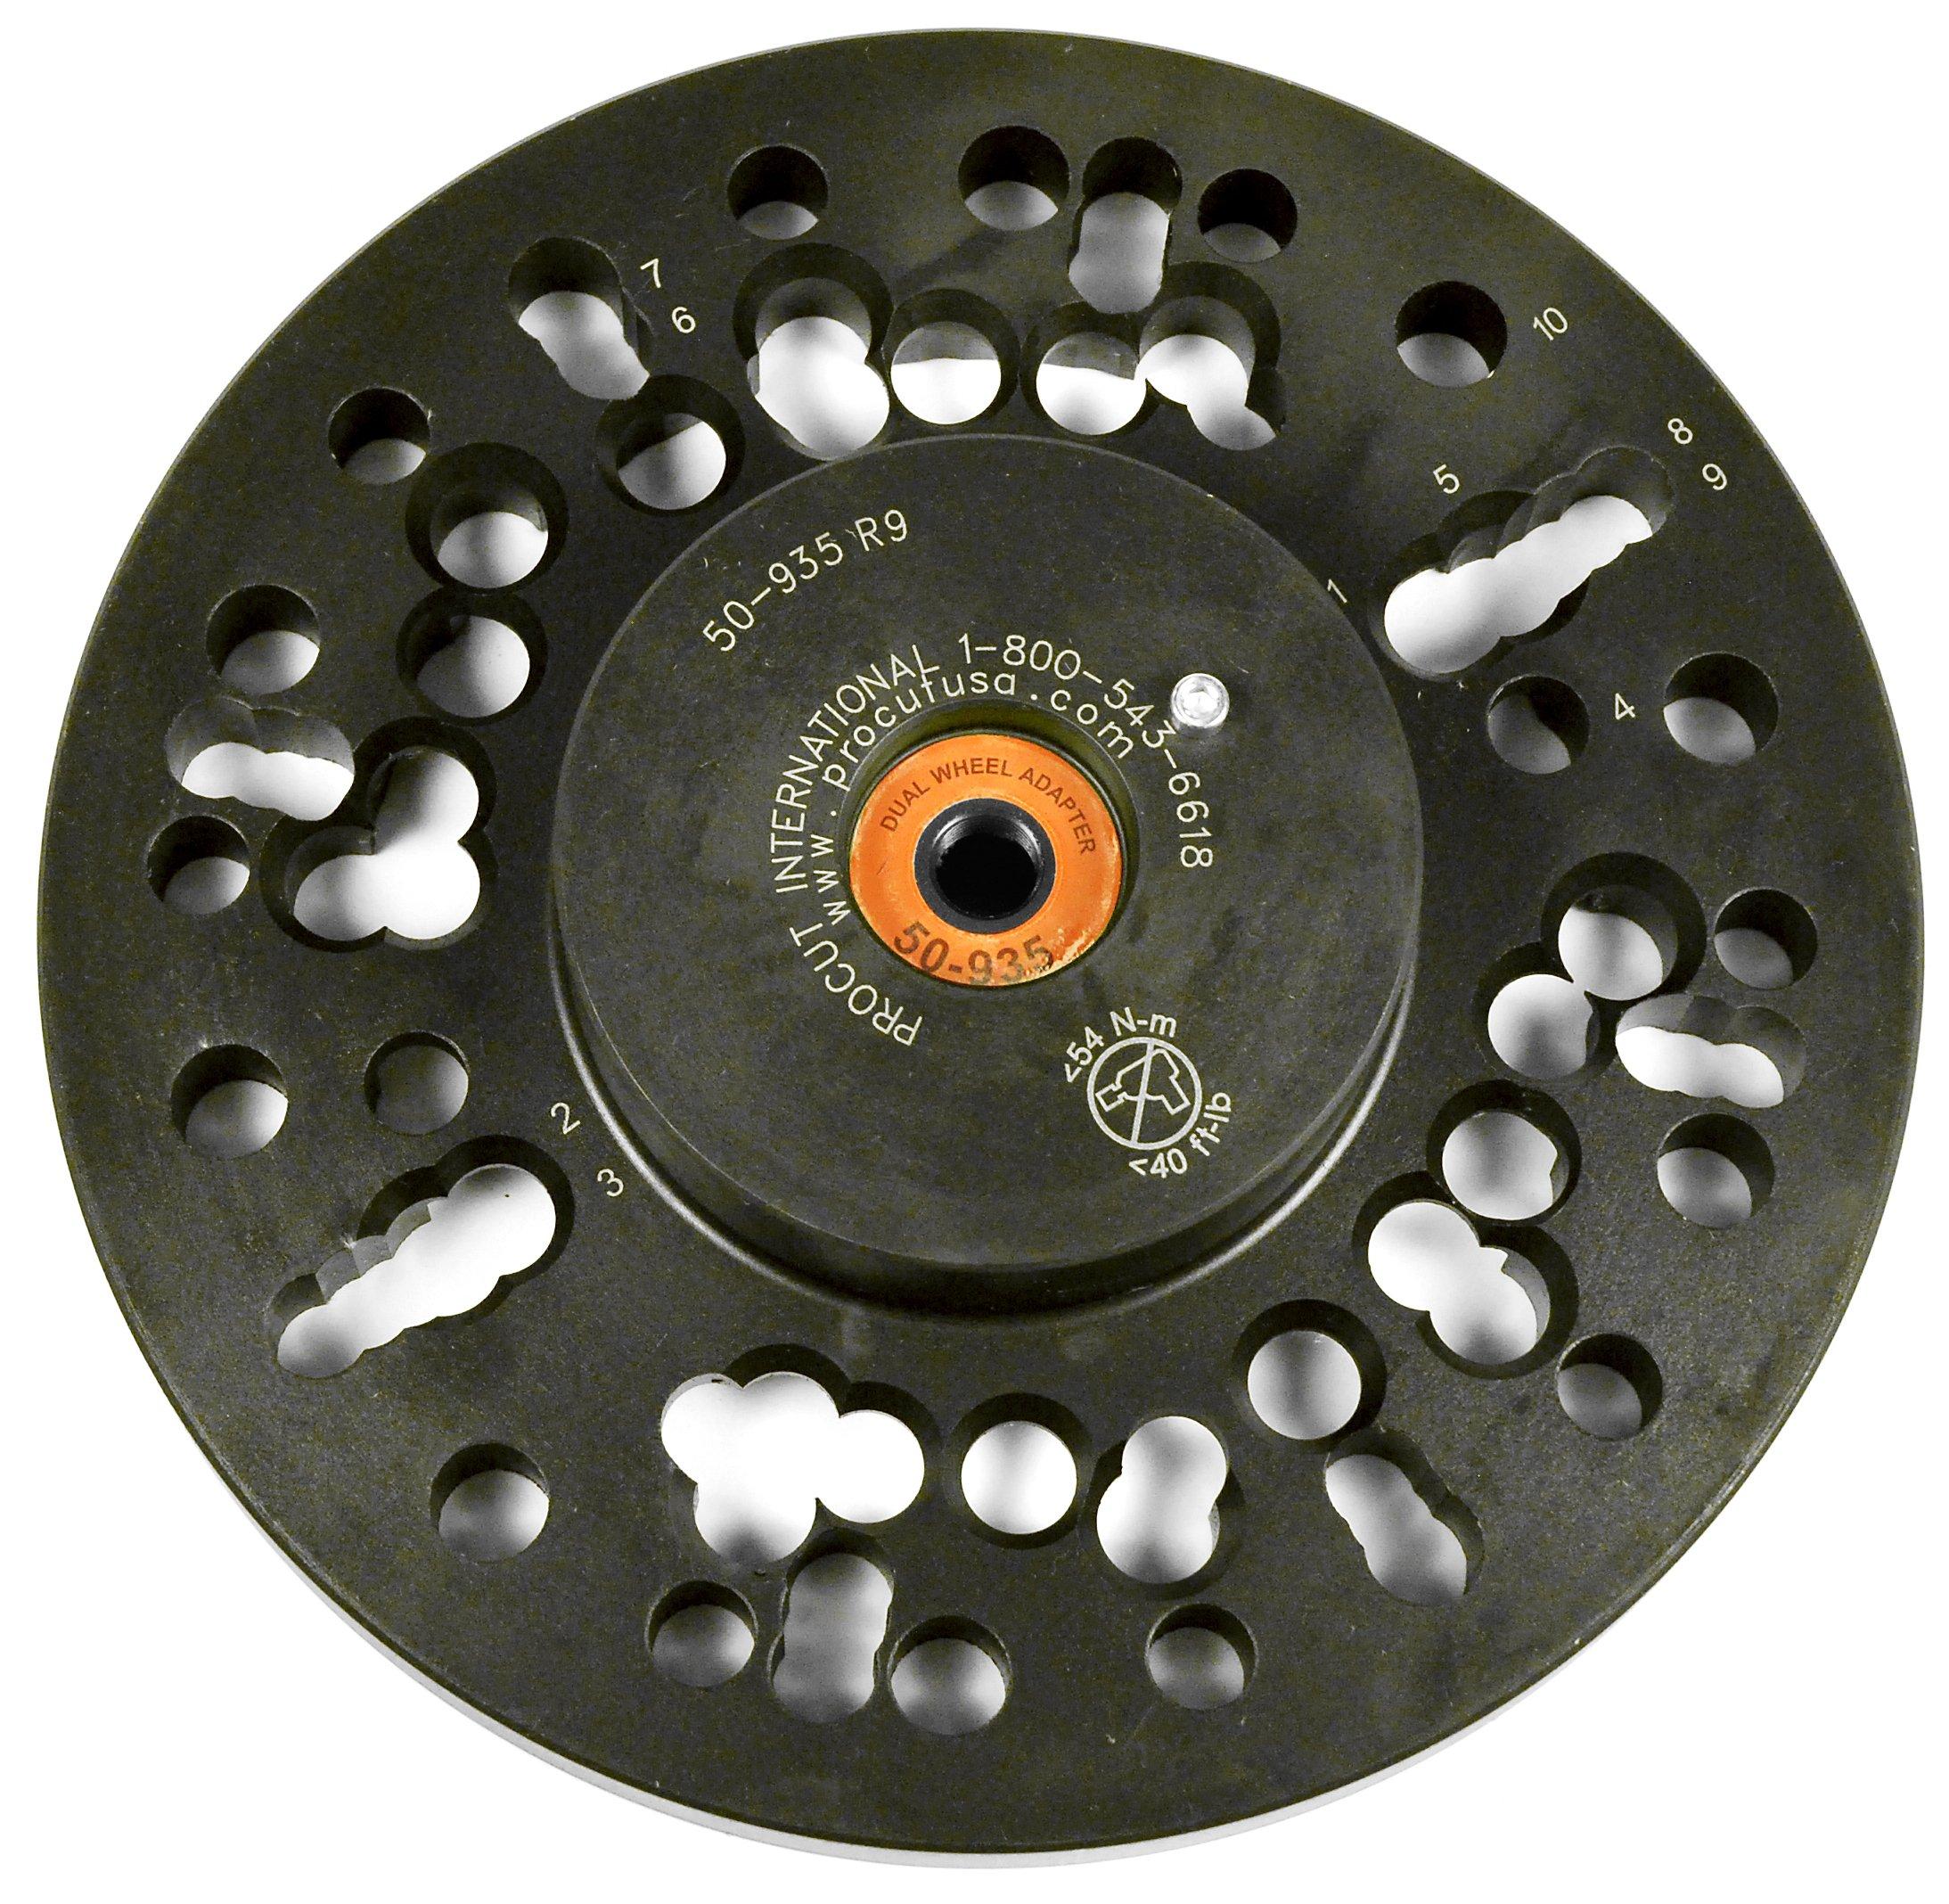 Pro-Cut 50-935 R9 DUAL WHEEL TRUCK ADAPTER